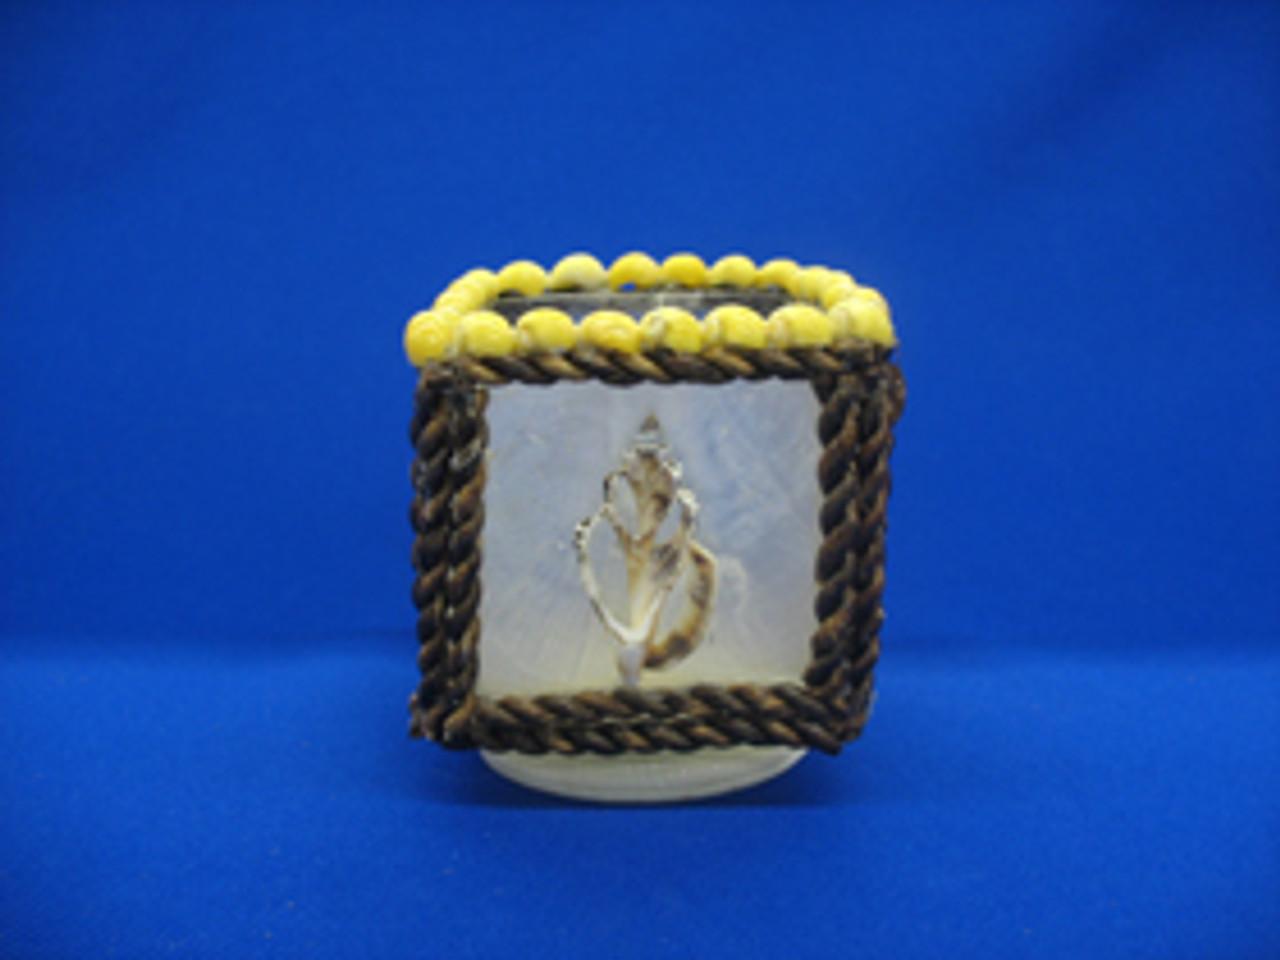 Capiz Cube Candle Holder